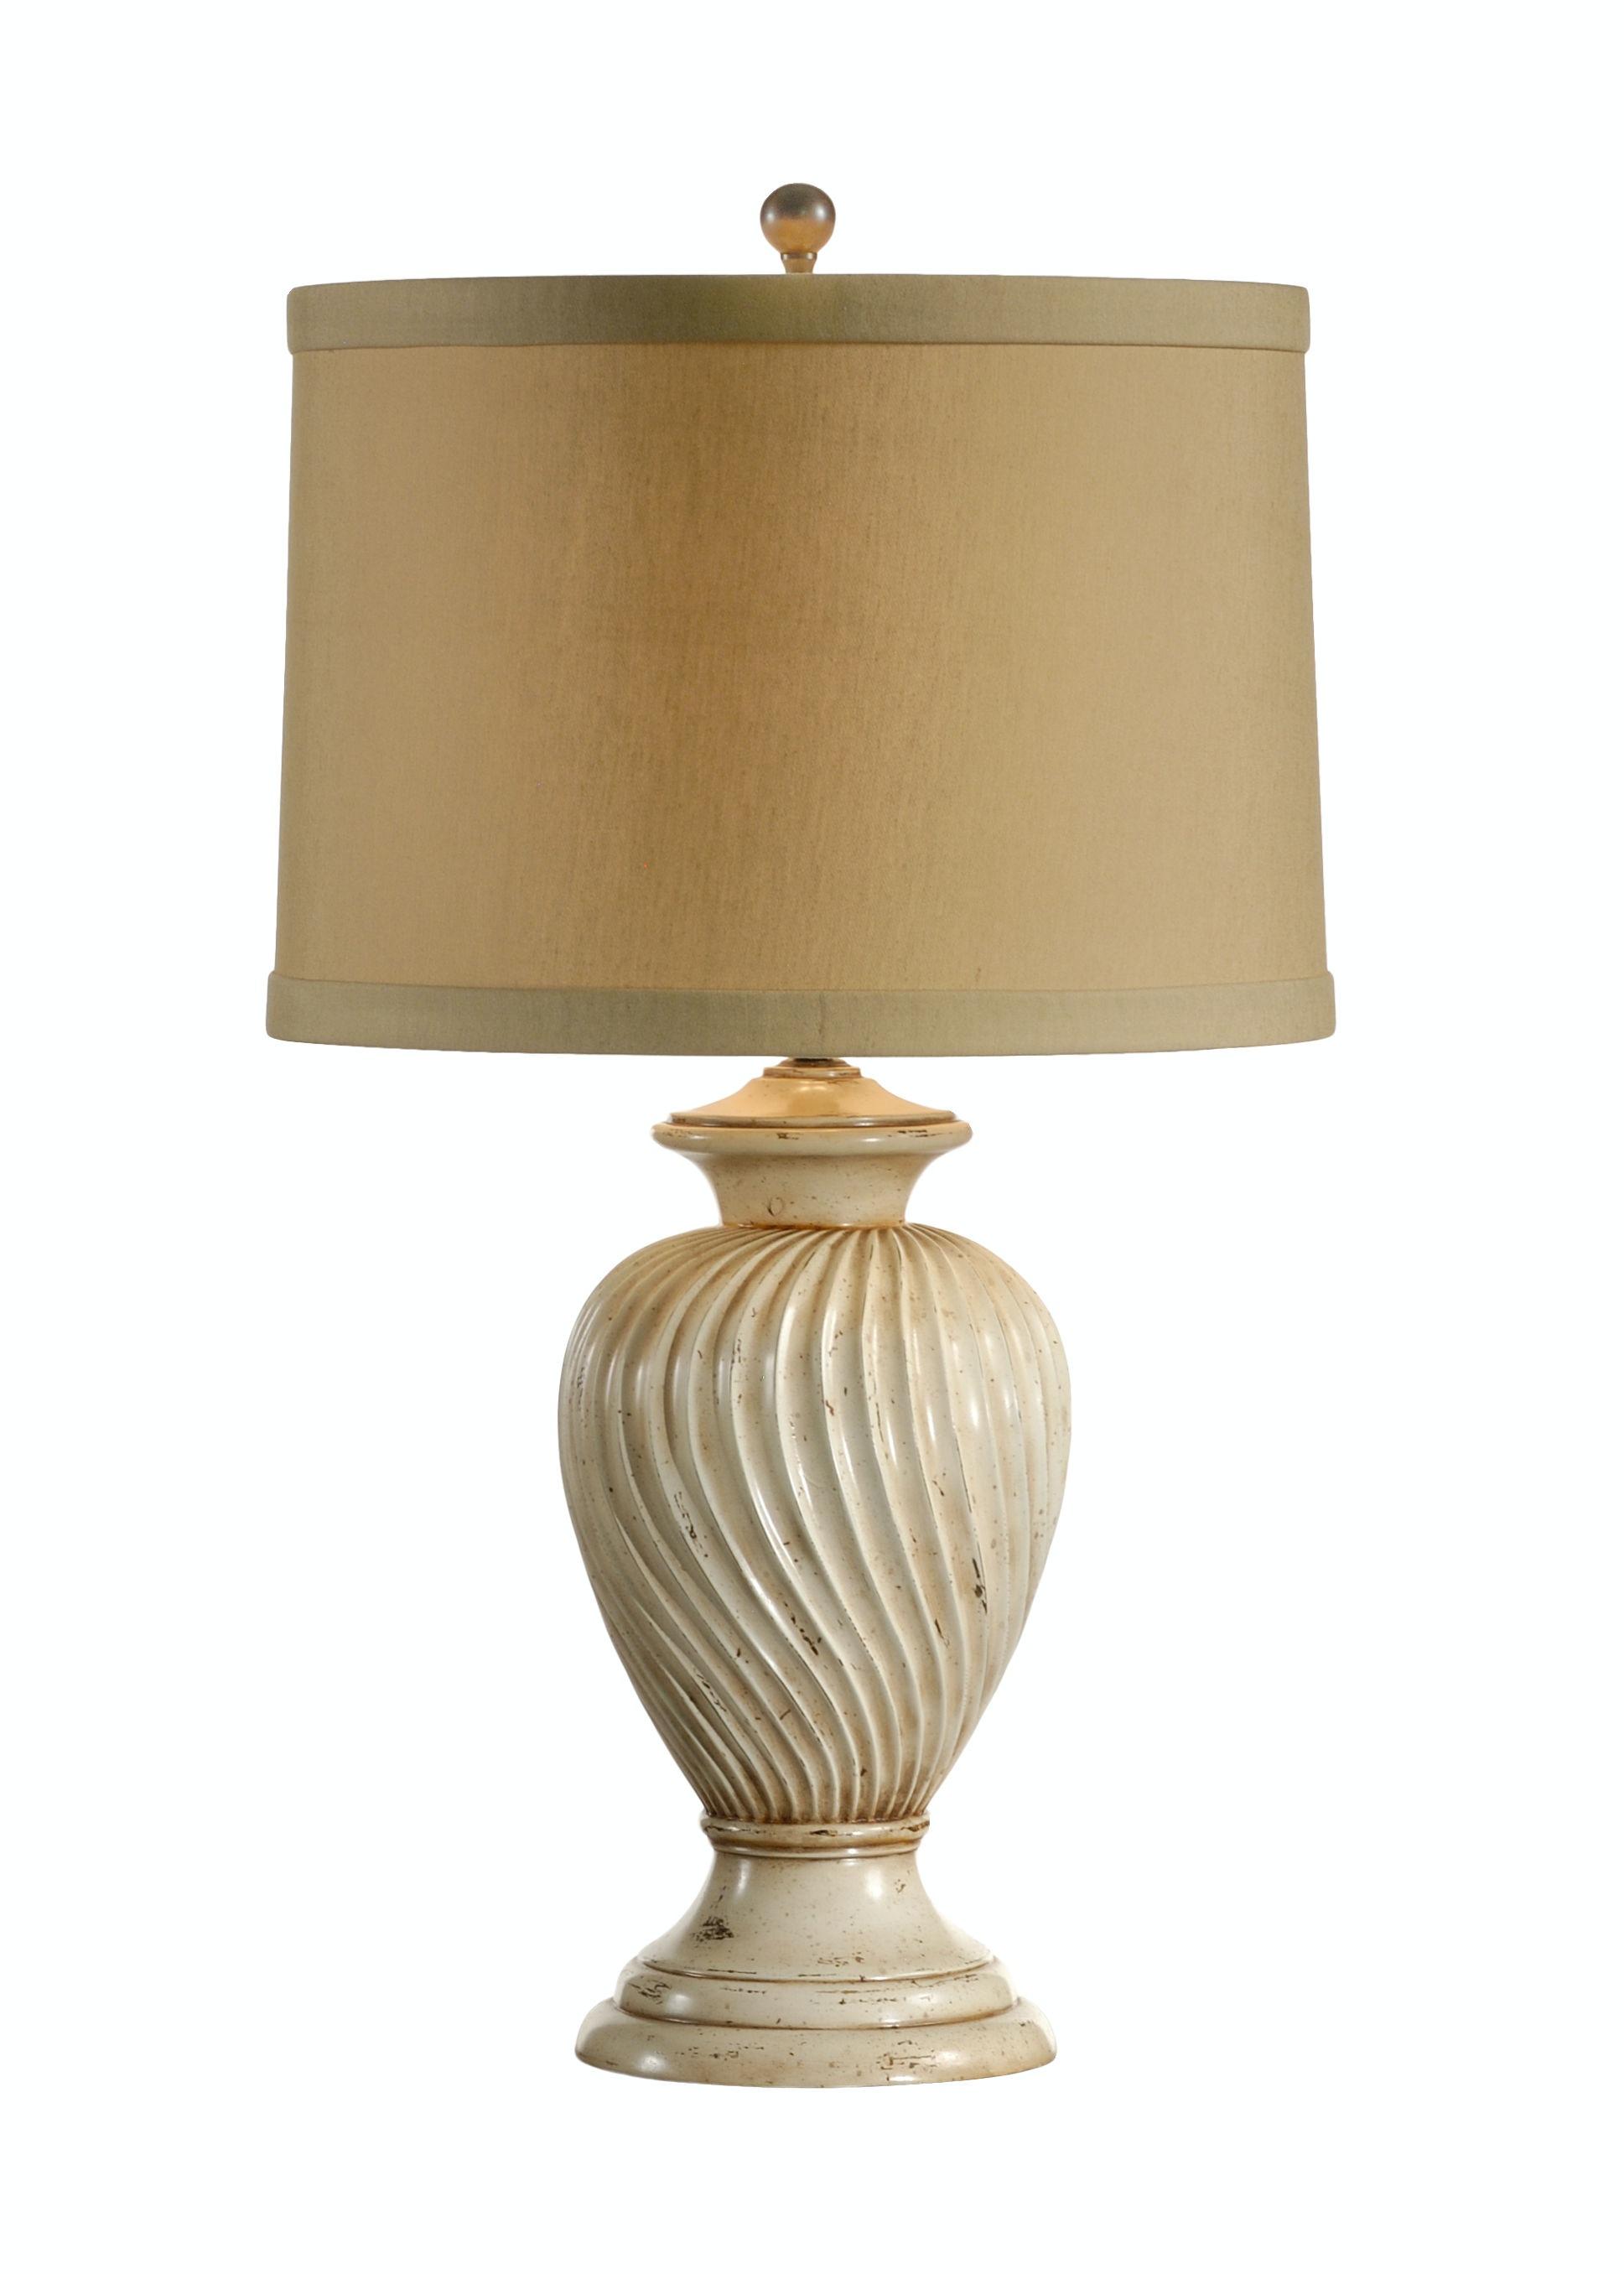 Wildwood Lamps Swirled Urn Lamp 11875